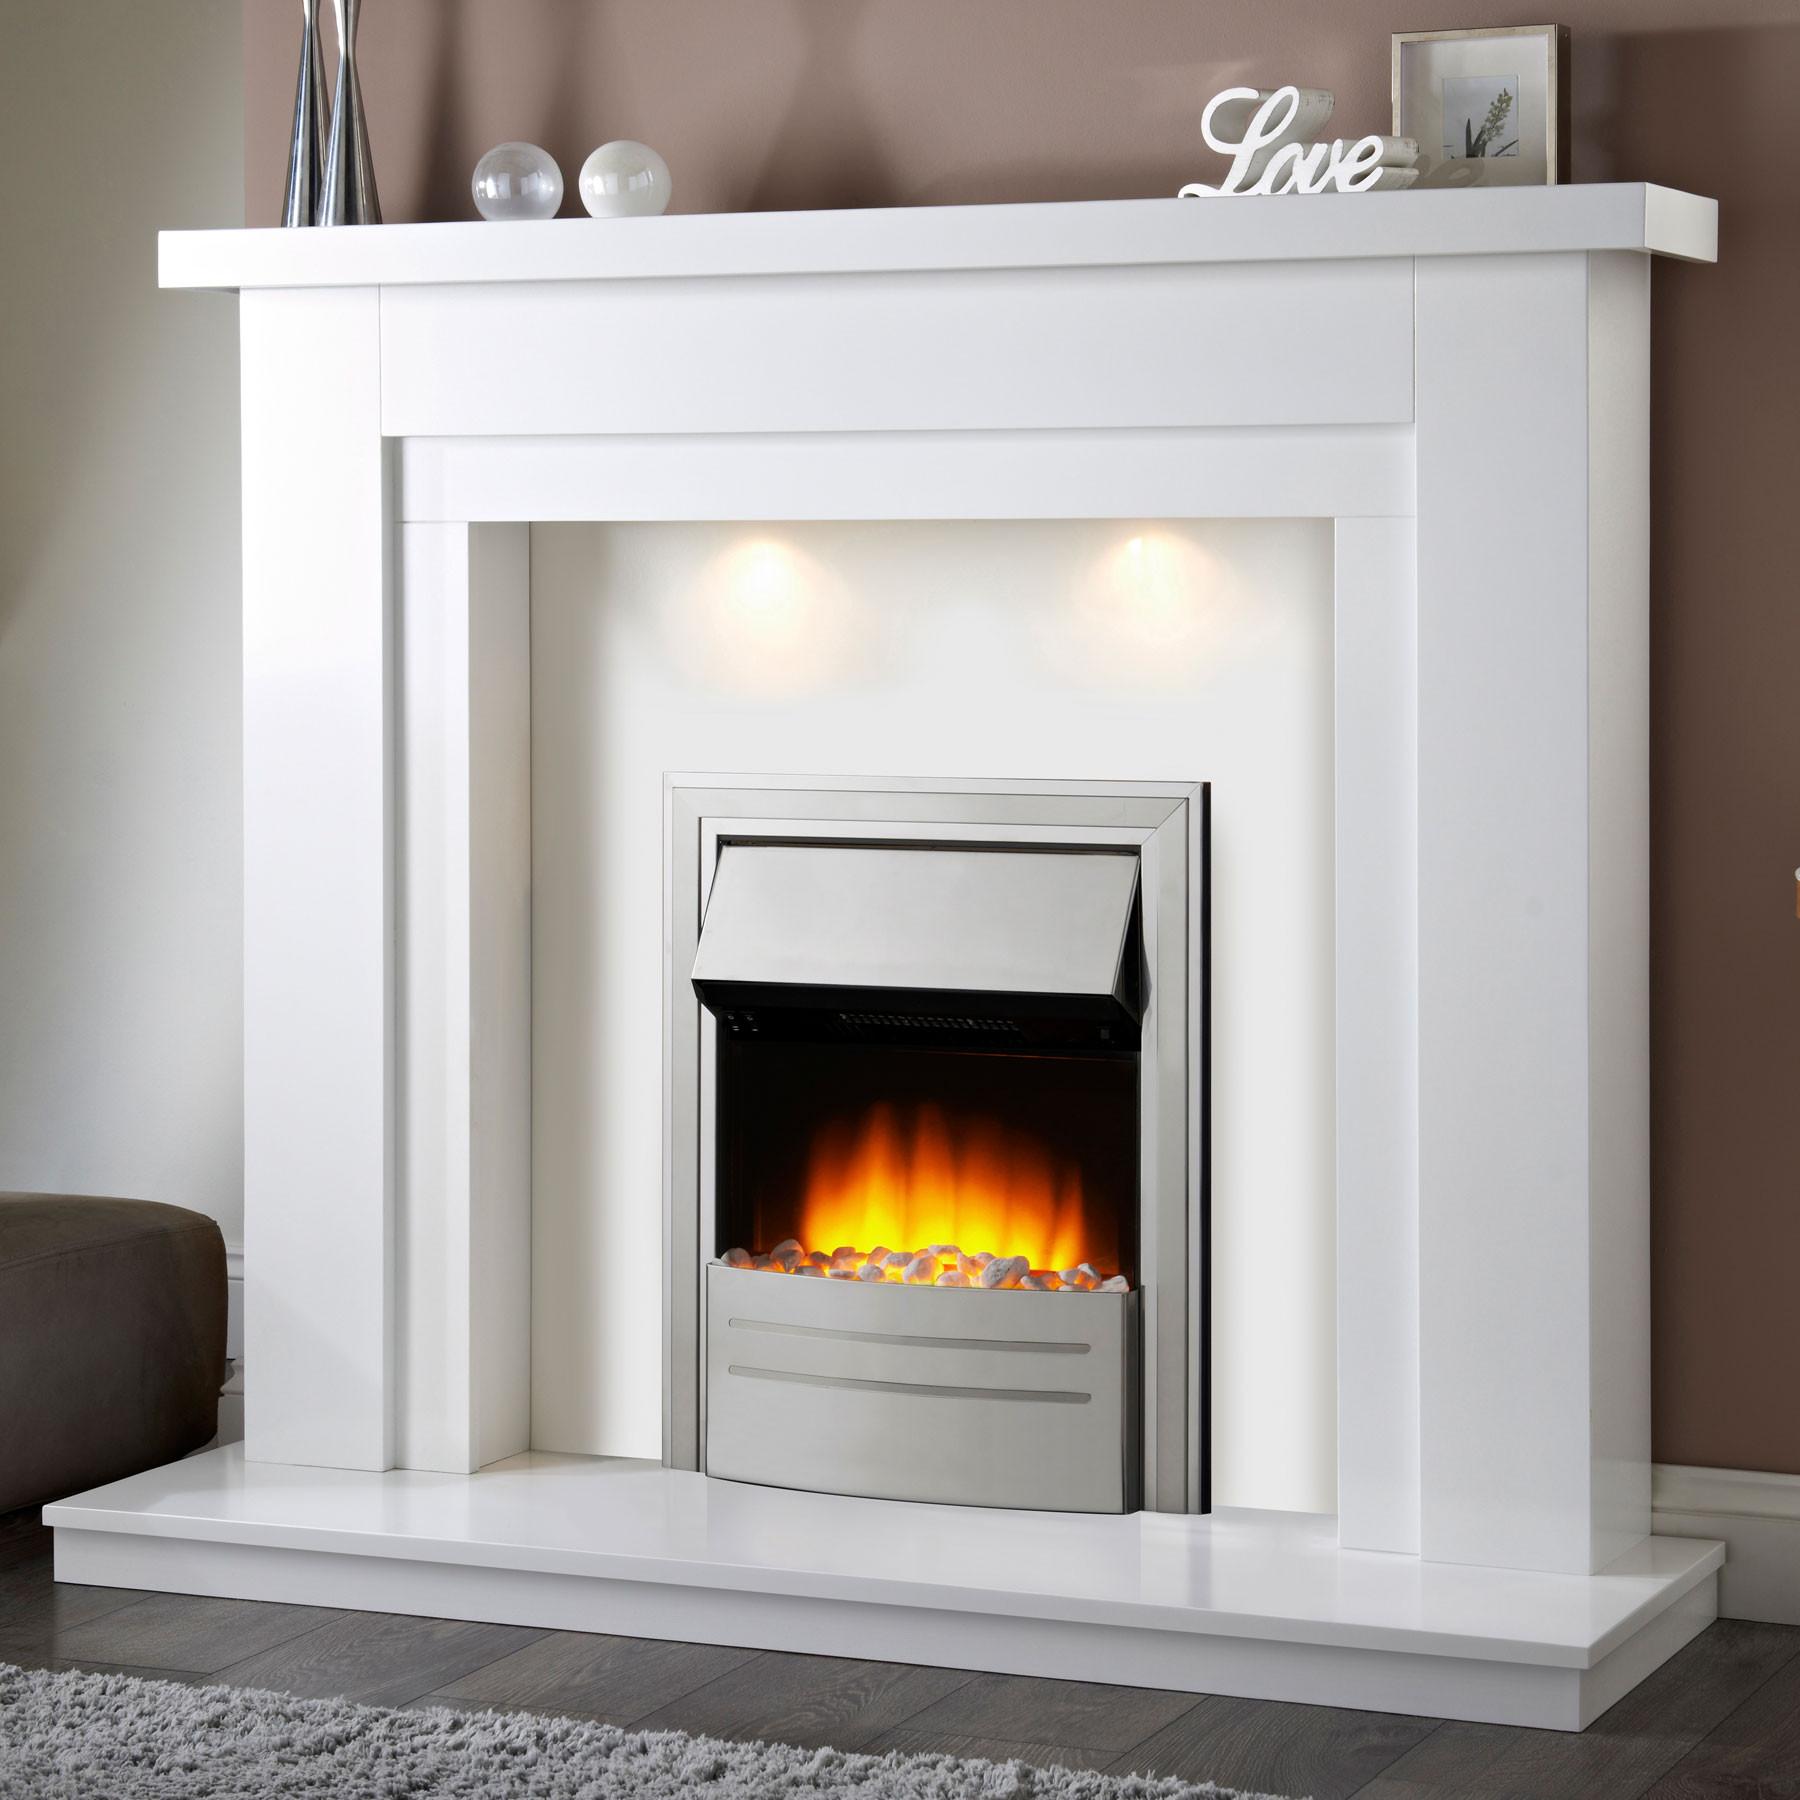 Pilgrim Fireplace tools Fresh White Fireplace Electric Charming Fireplace